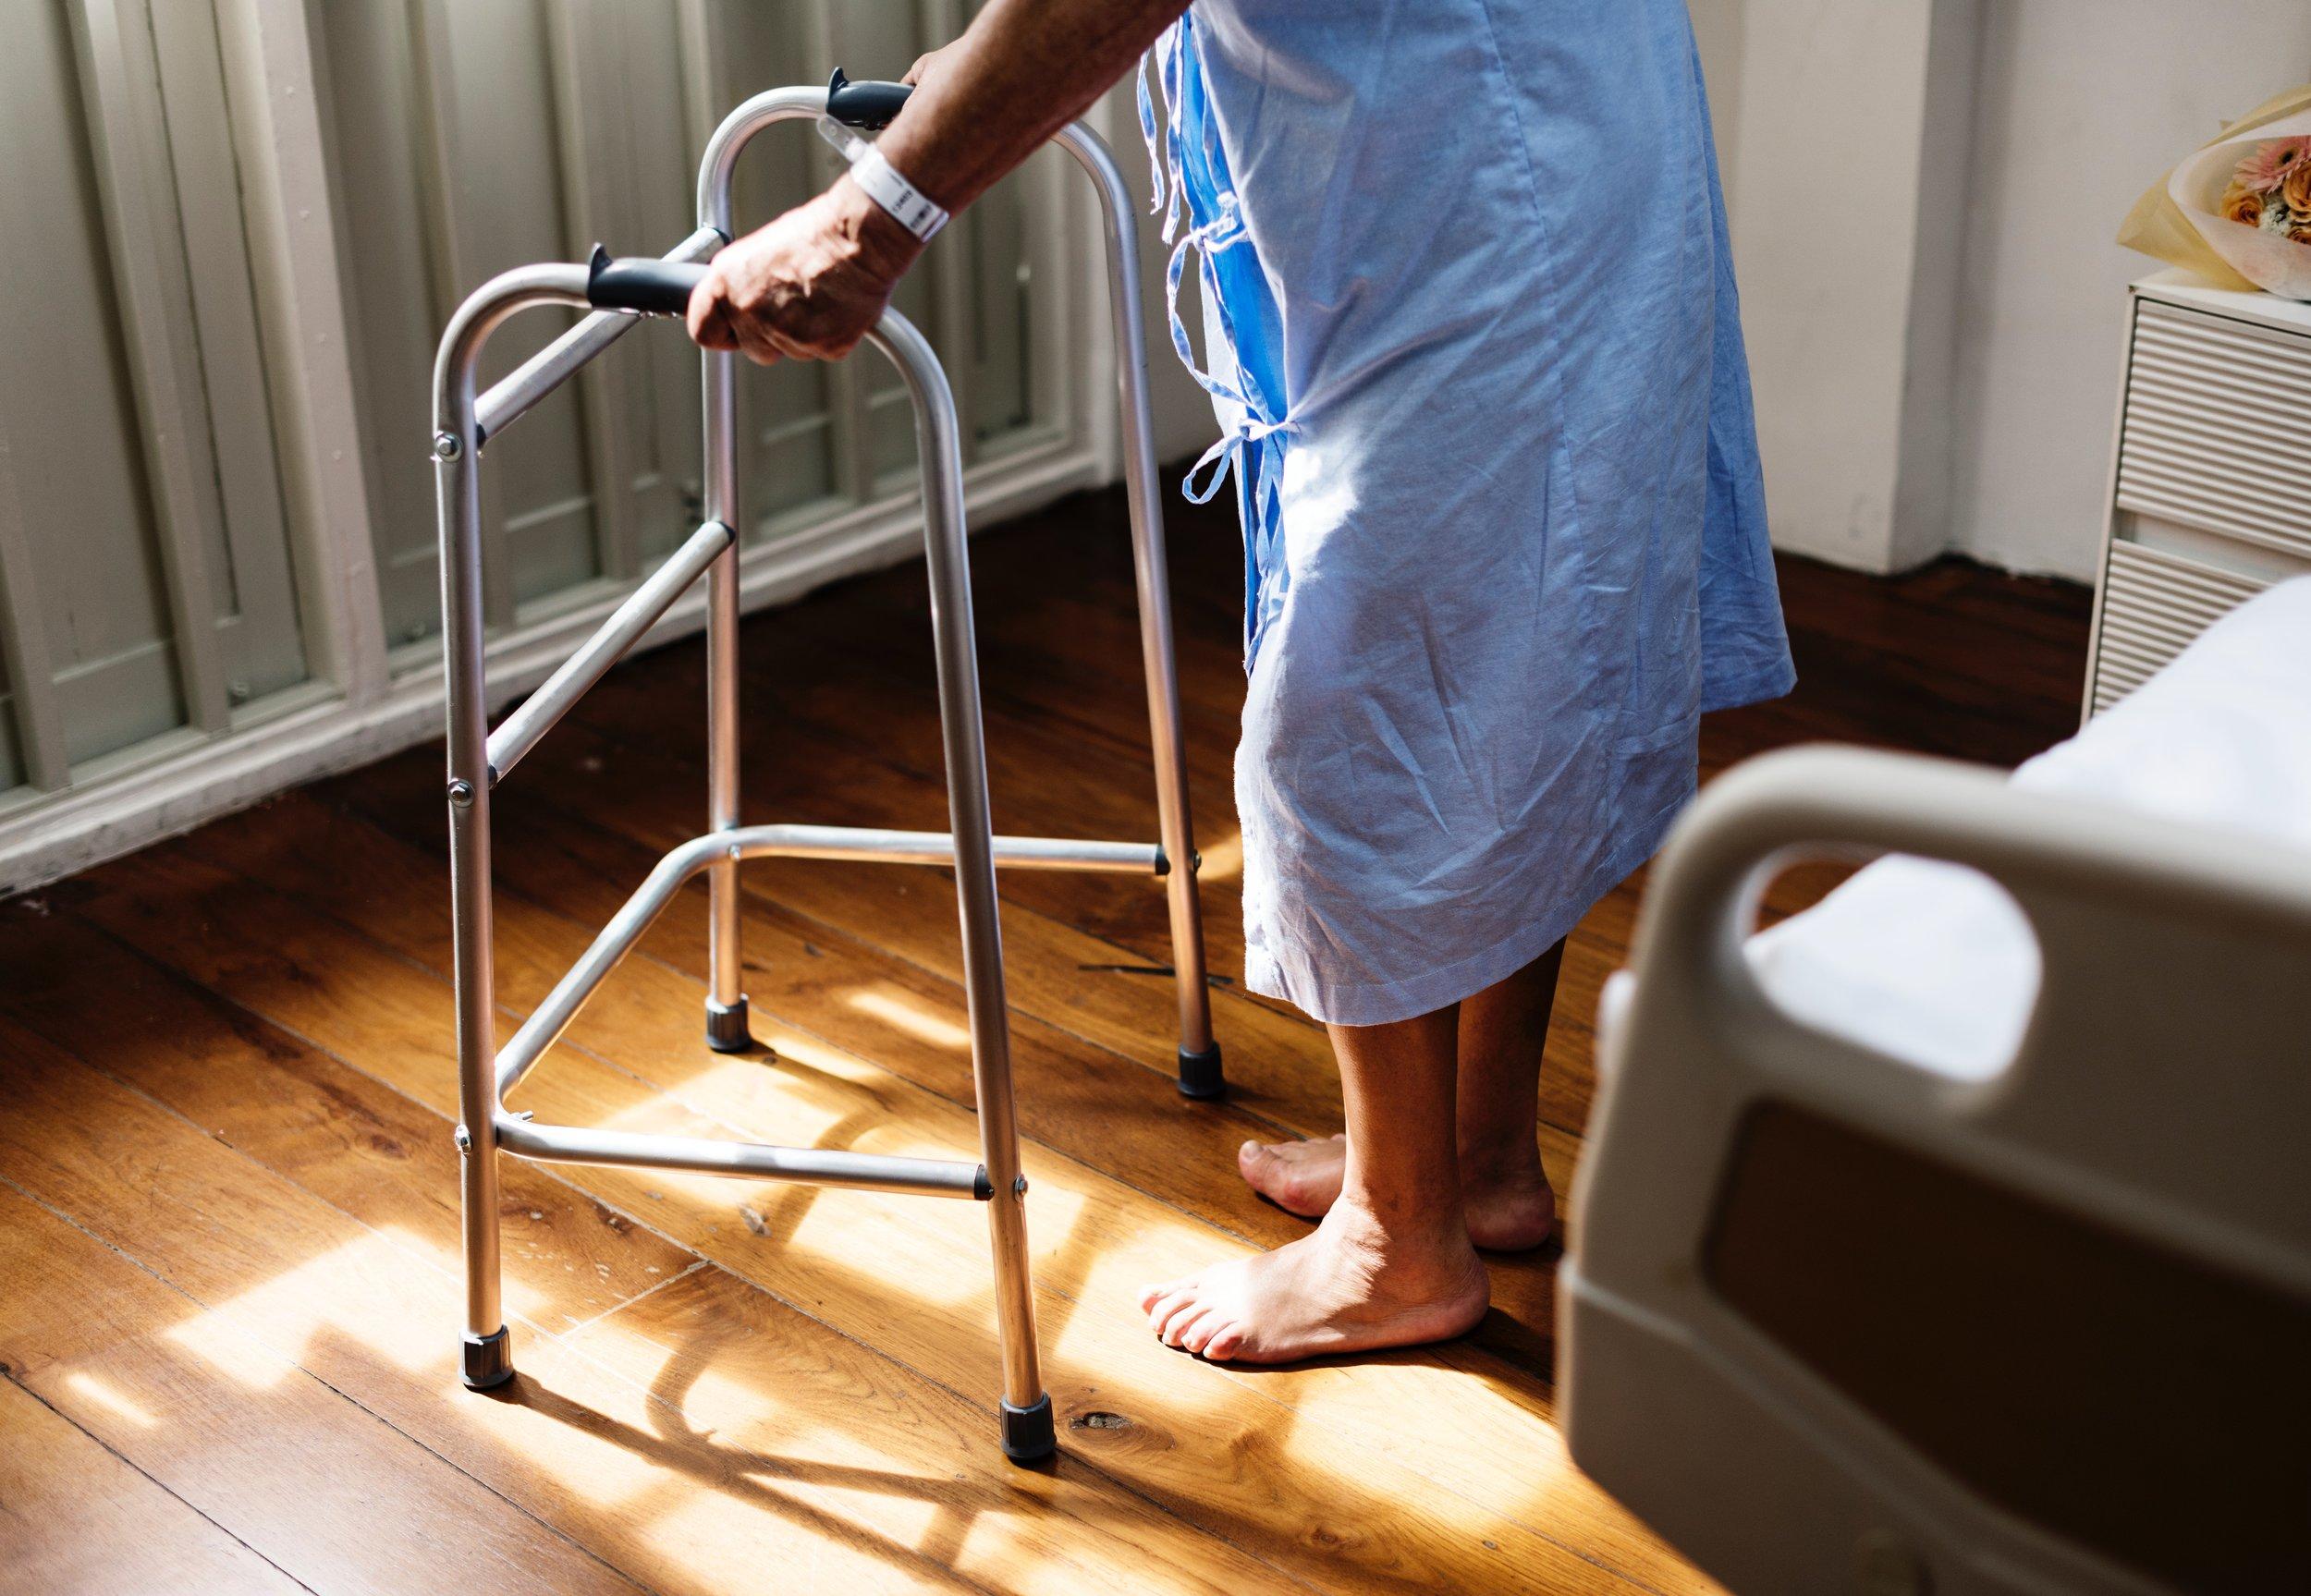 adult-care-elderly-748780.jpg